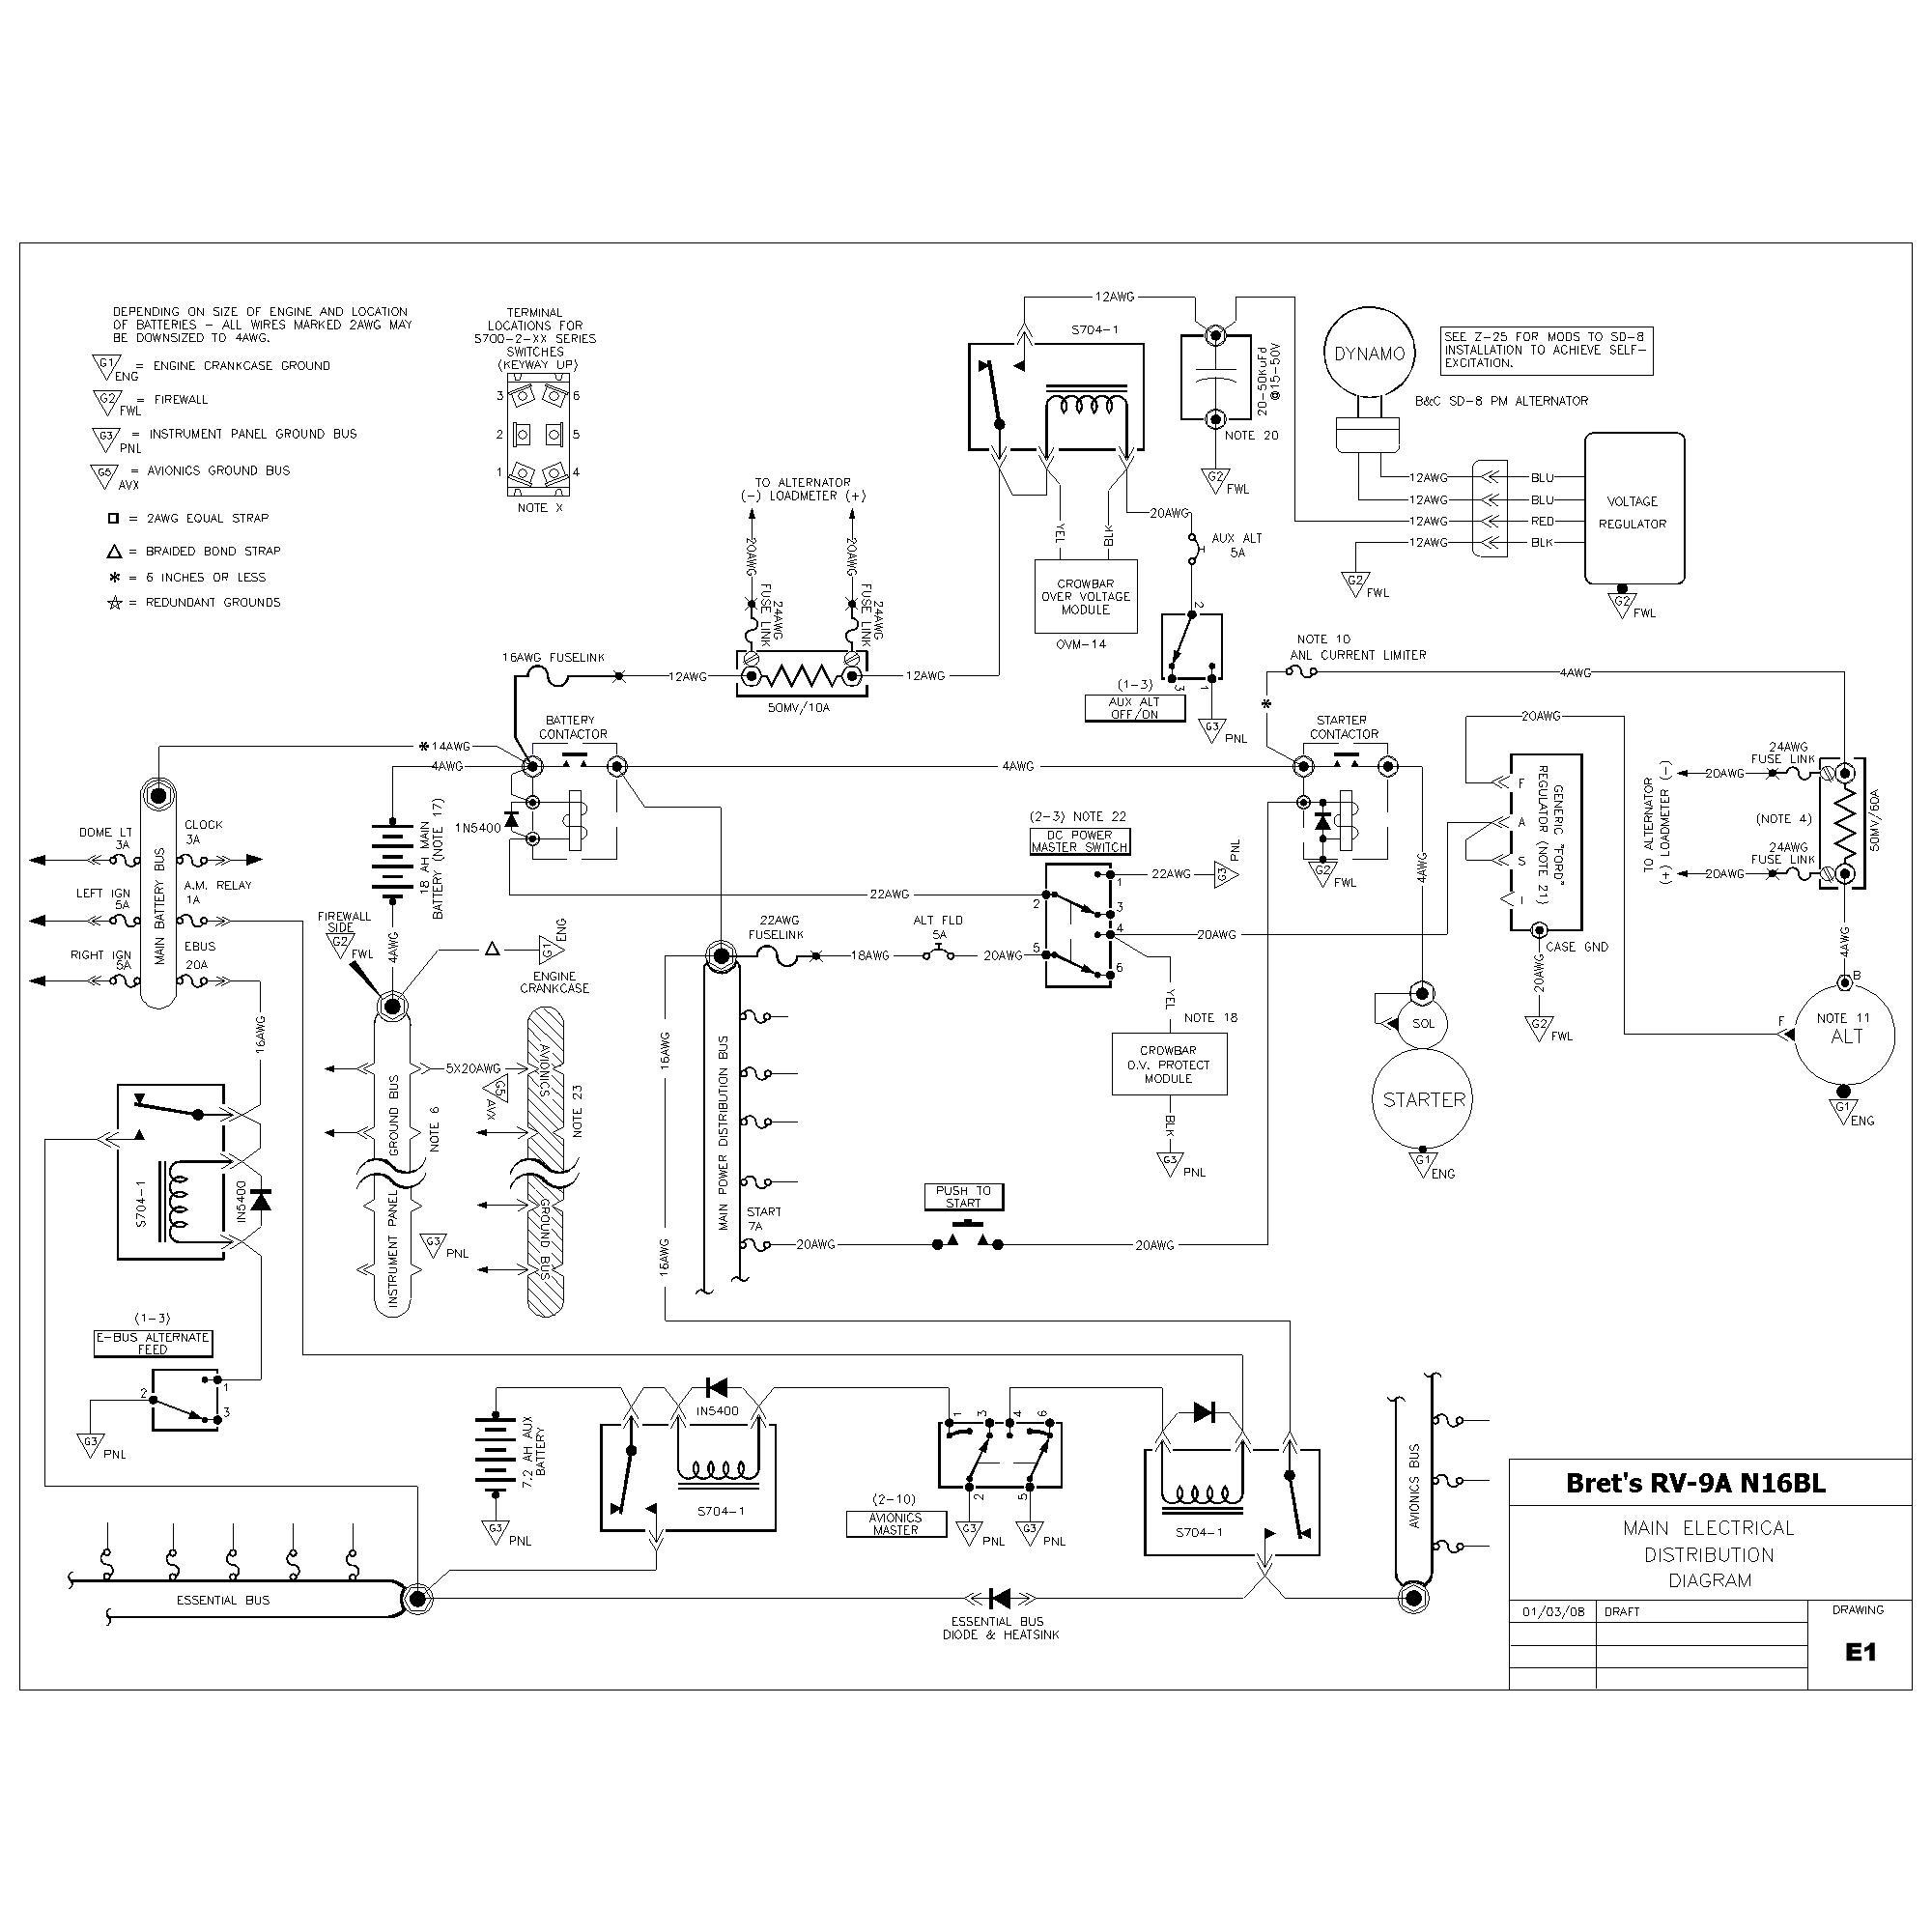 1985 hd wiring diagram relays charmglow gas fireplace rh rfid locker co